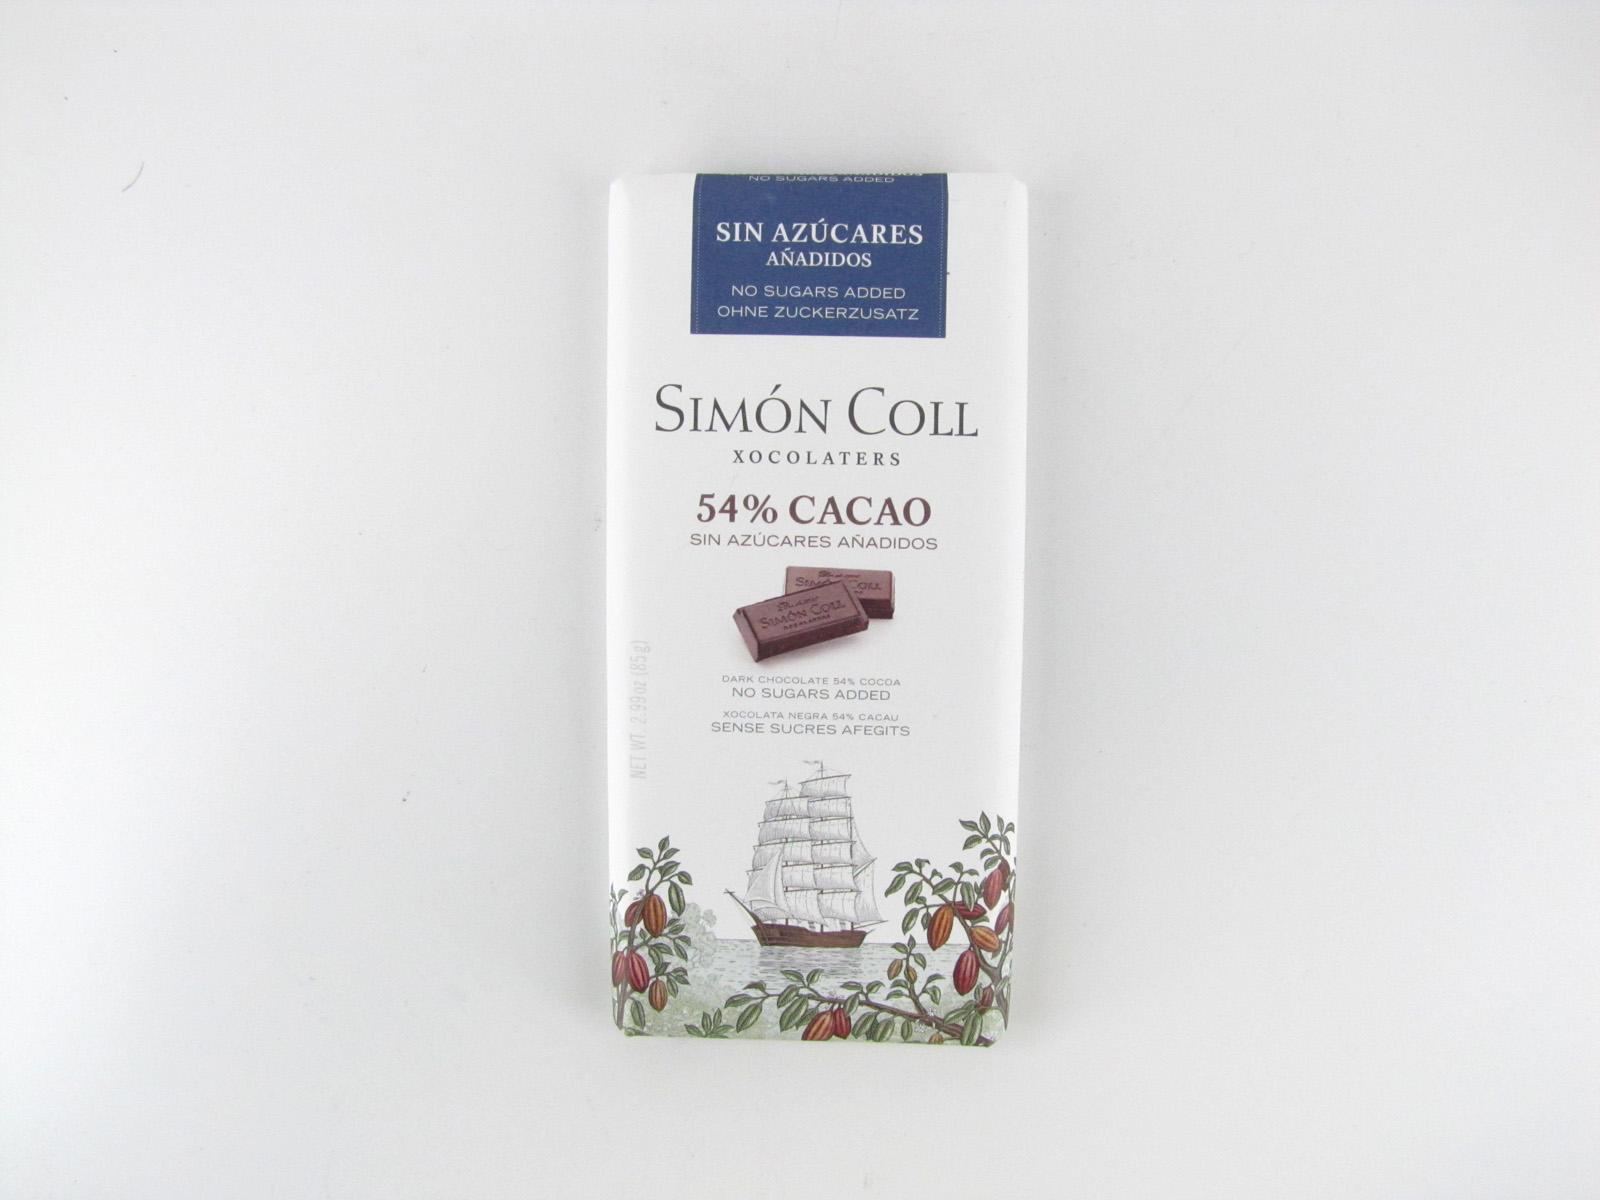 Simon Coll Dark Chocolate - front view